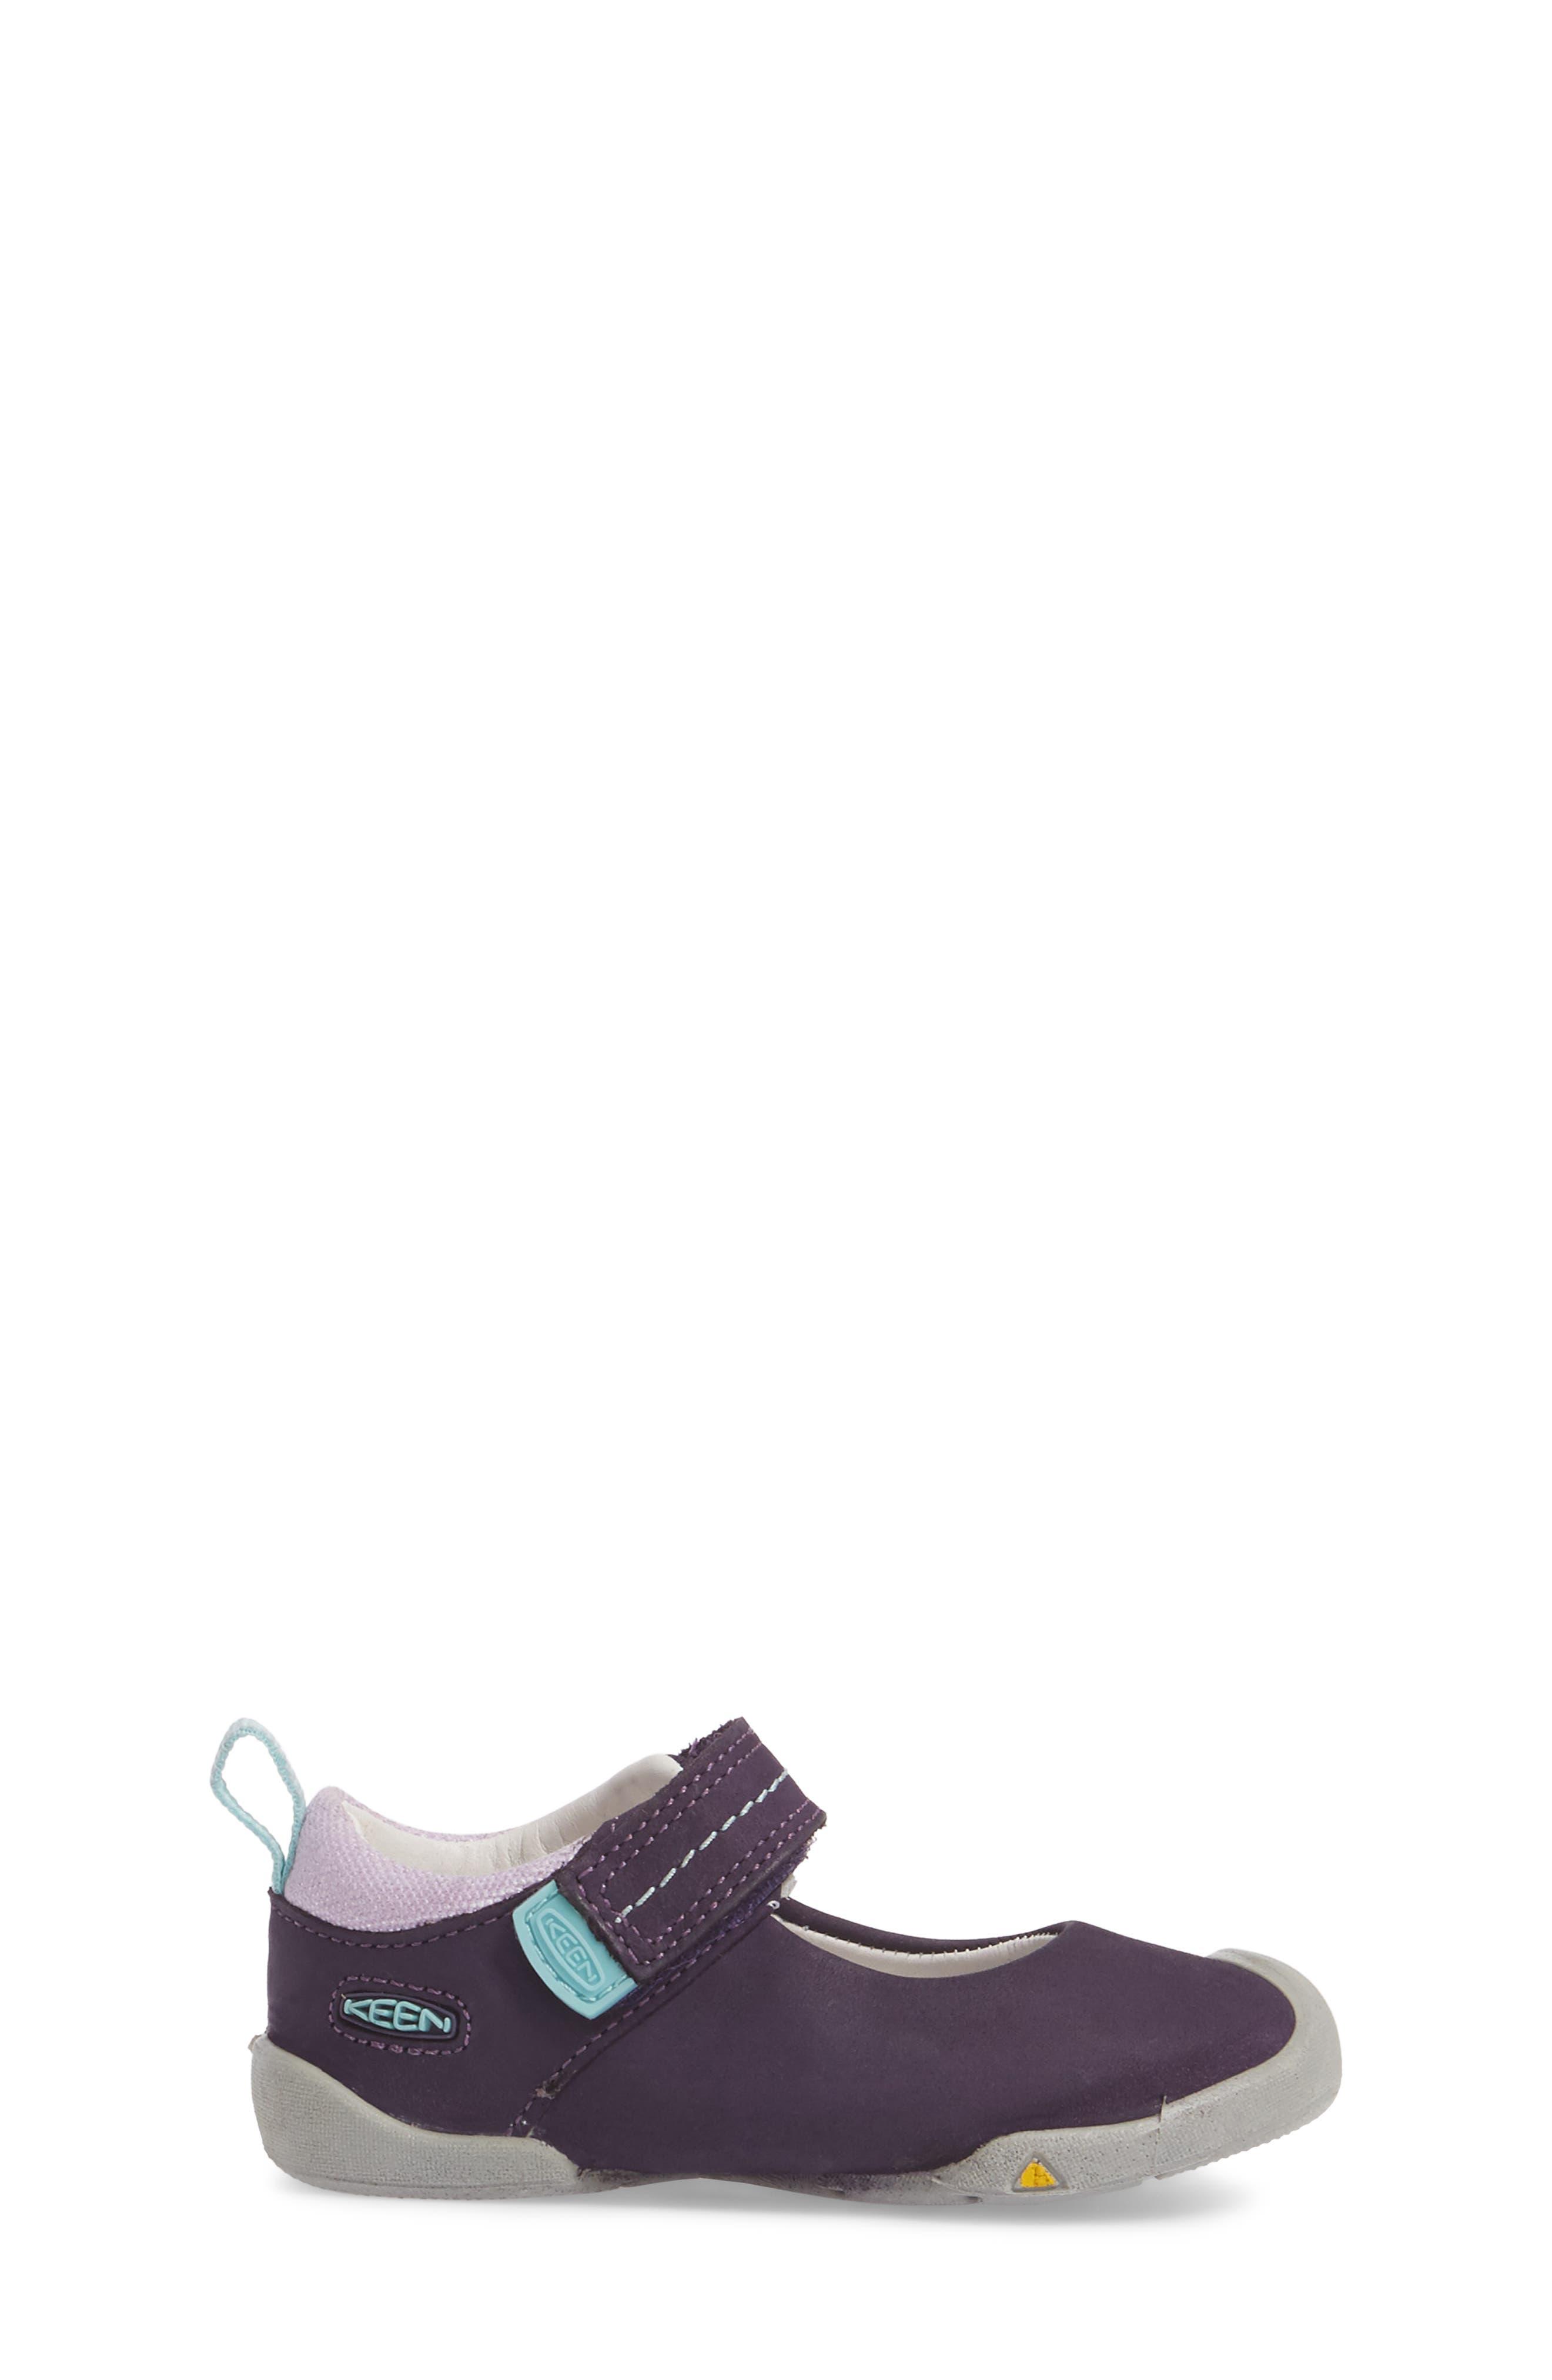 Pep Mary Jane-T Sneaker,                             Alternate thumbnail 6, color,